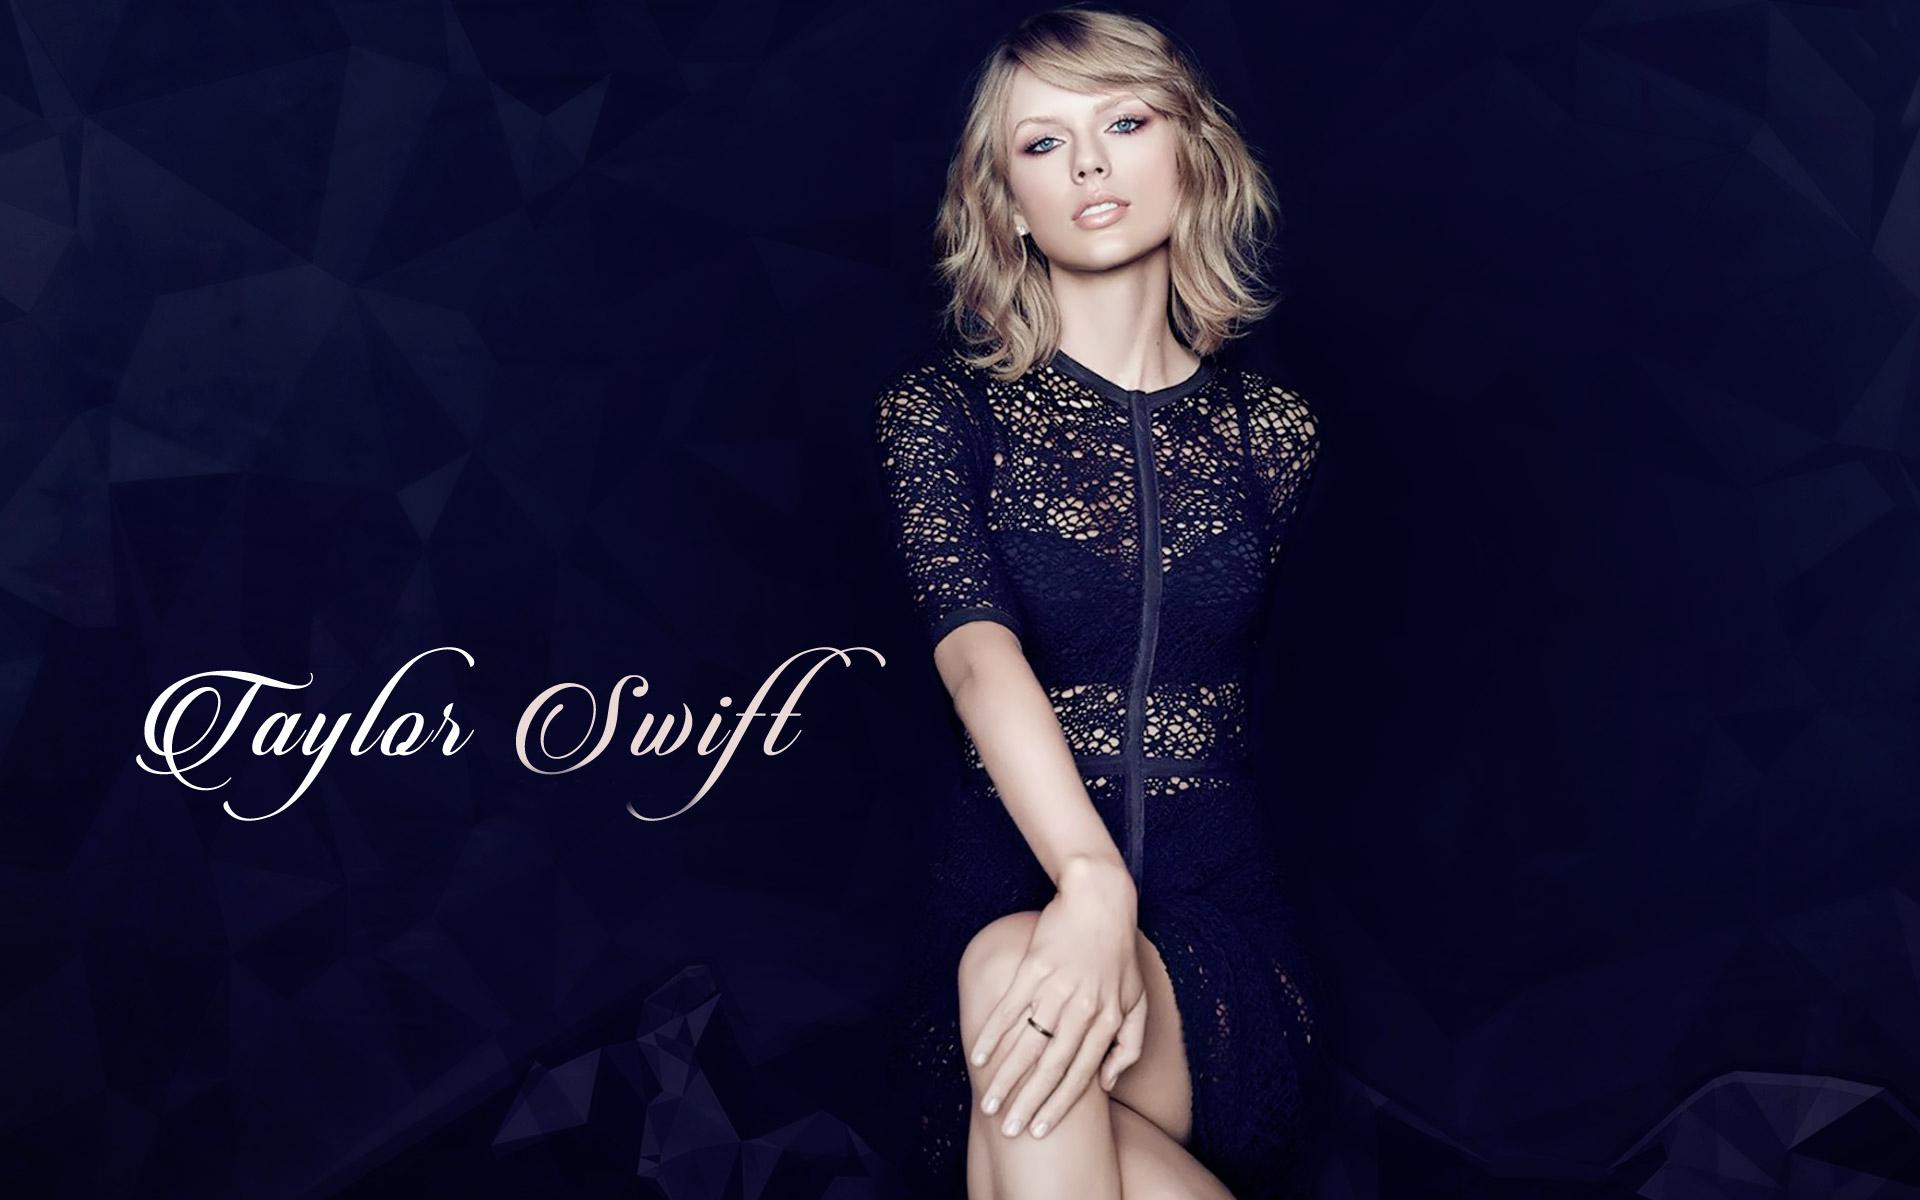 Taylor Swift 2015 Wallpaper 1920x1200